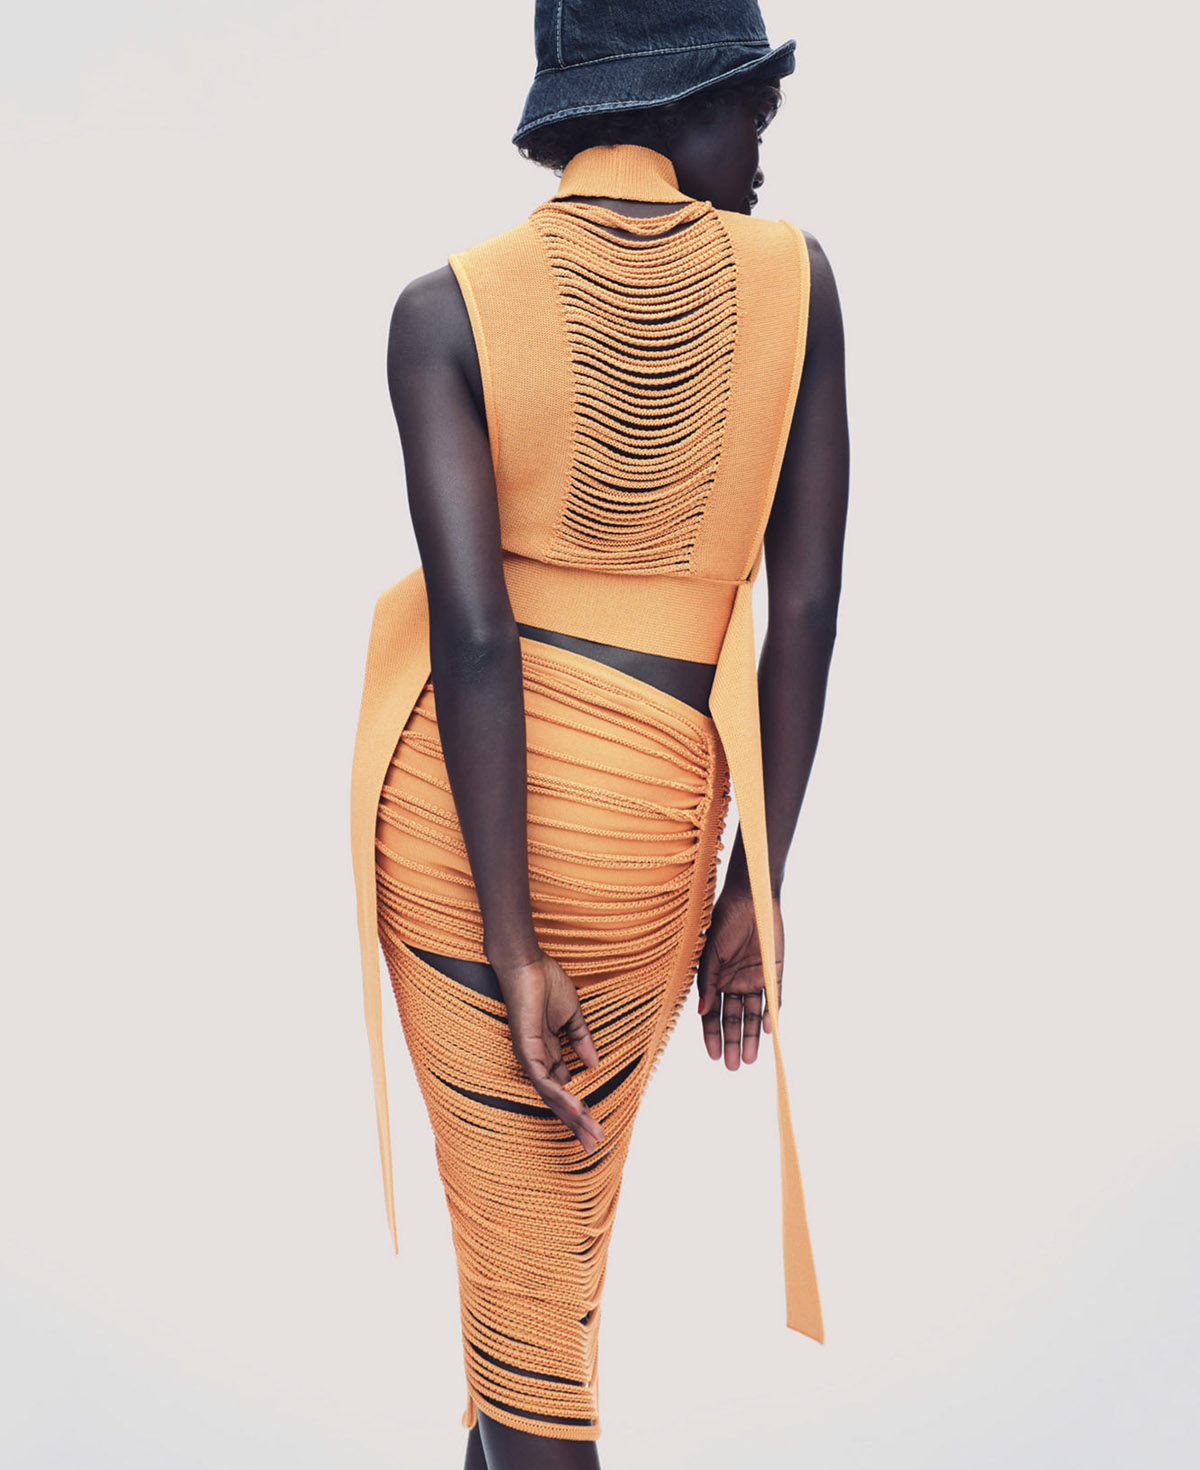 Akon Changkou by Nathaniel Goldberg for Elle US March 2021